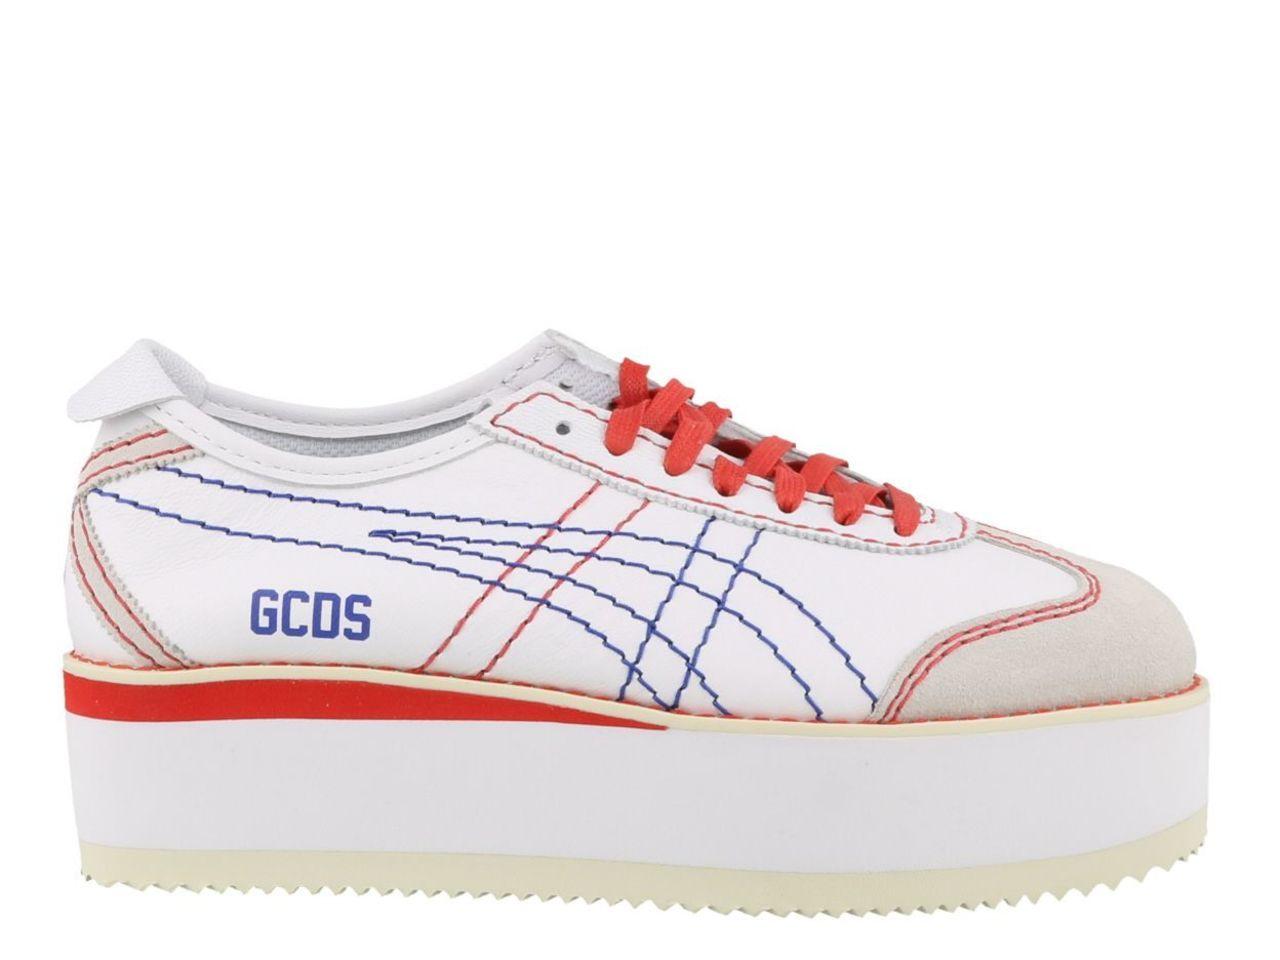 Gcds Mexico Platform Sneakers